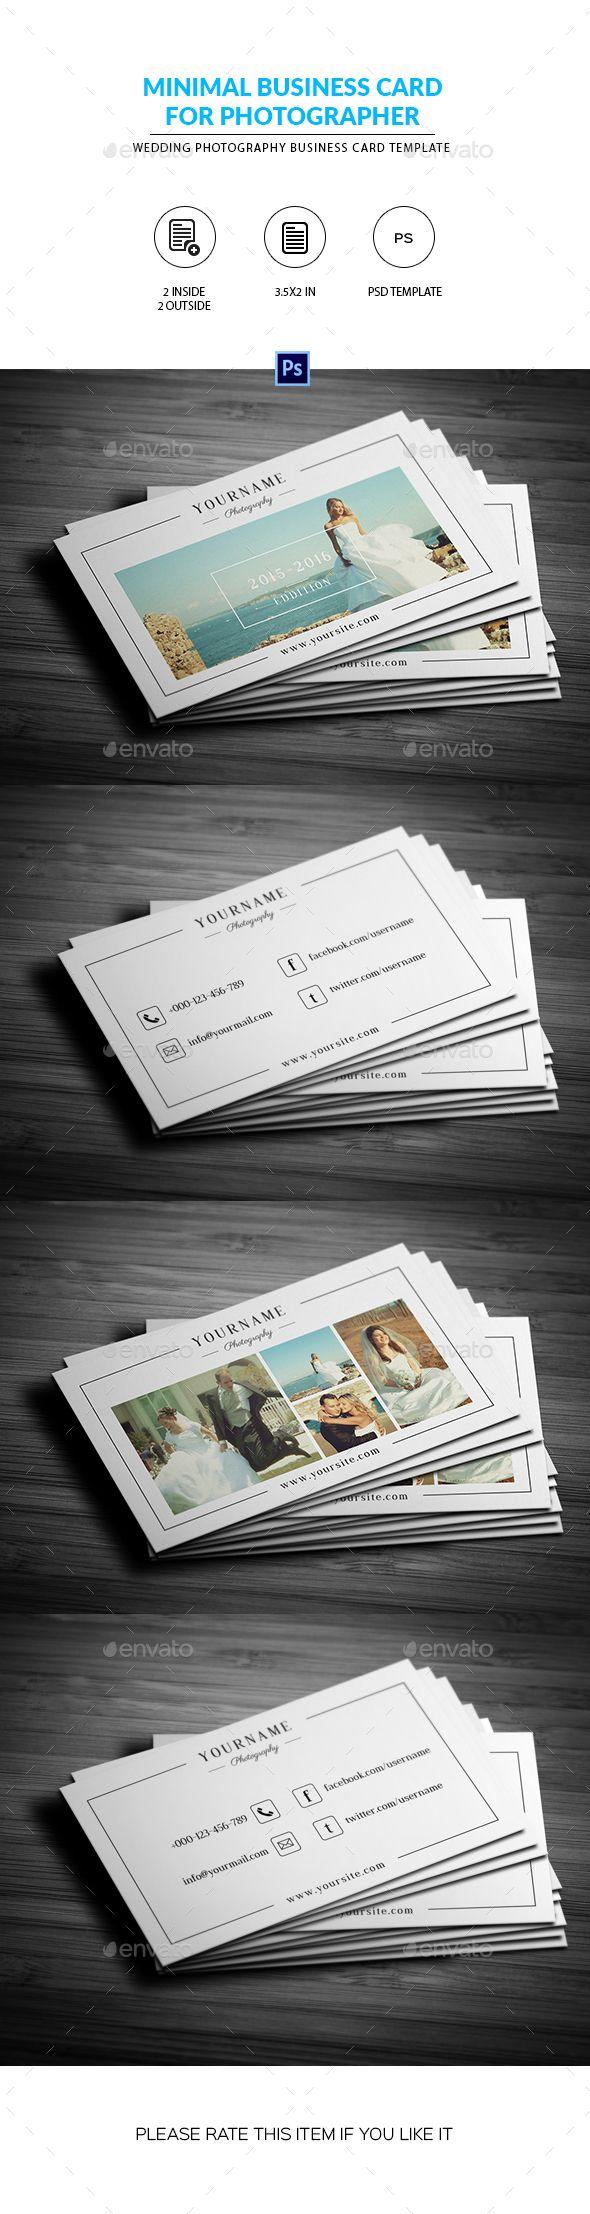 Minimal wedding photography business card template psd perfect minimal wedding photography business card template psd friedricerecipe Images